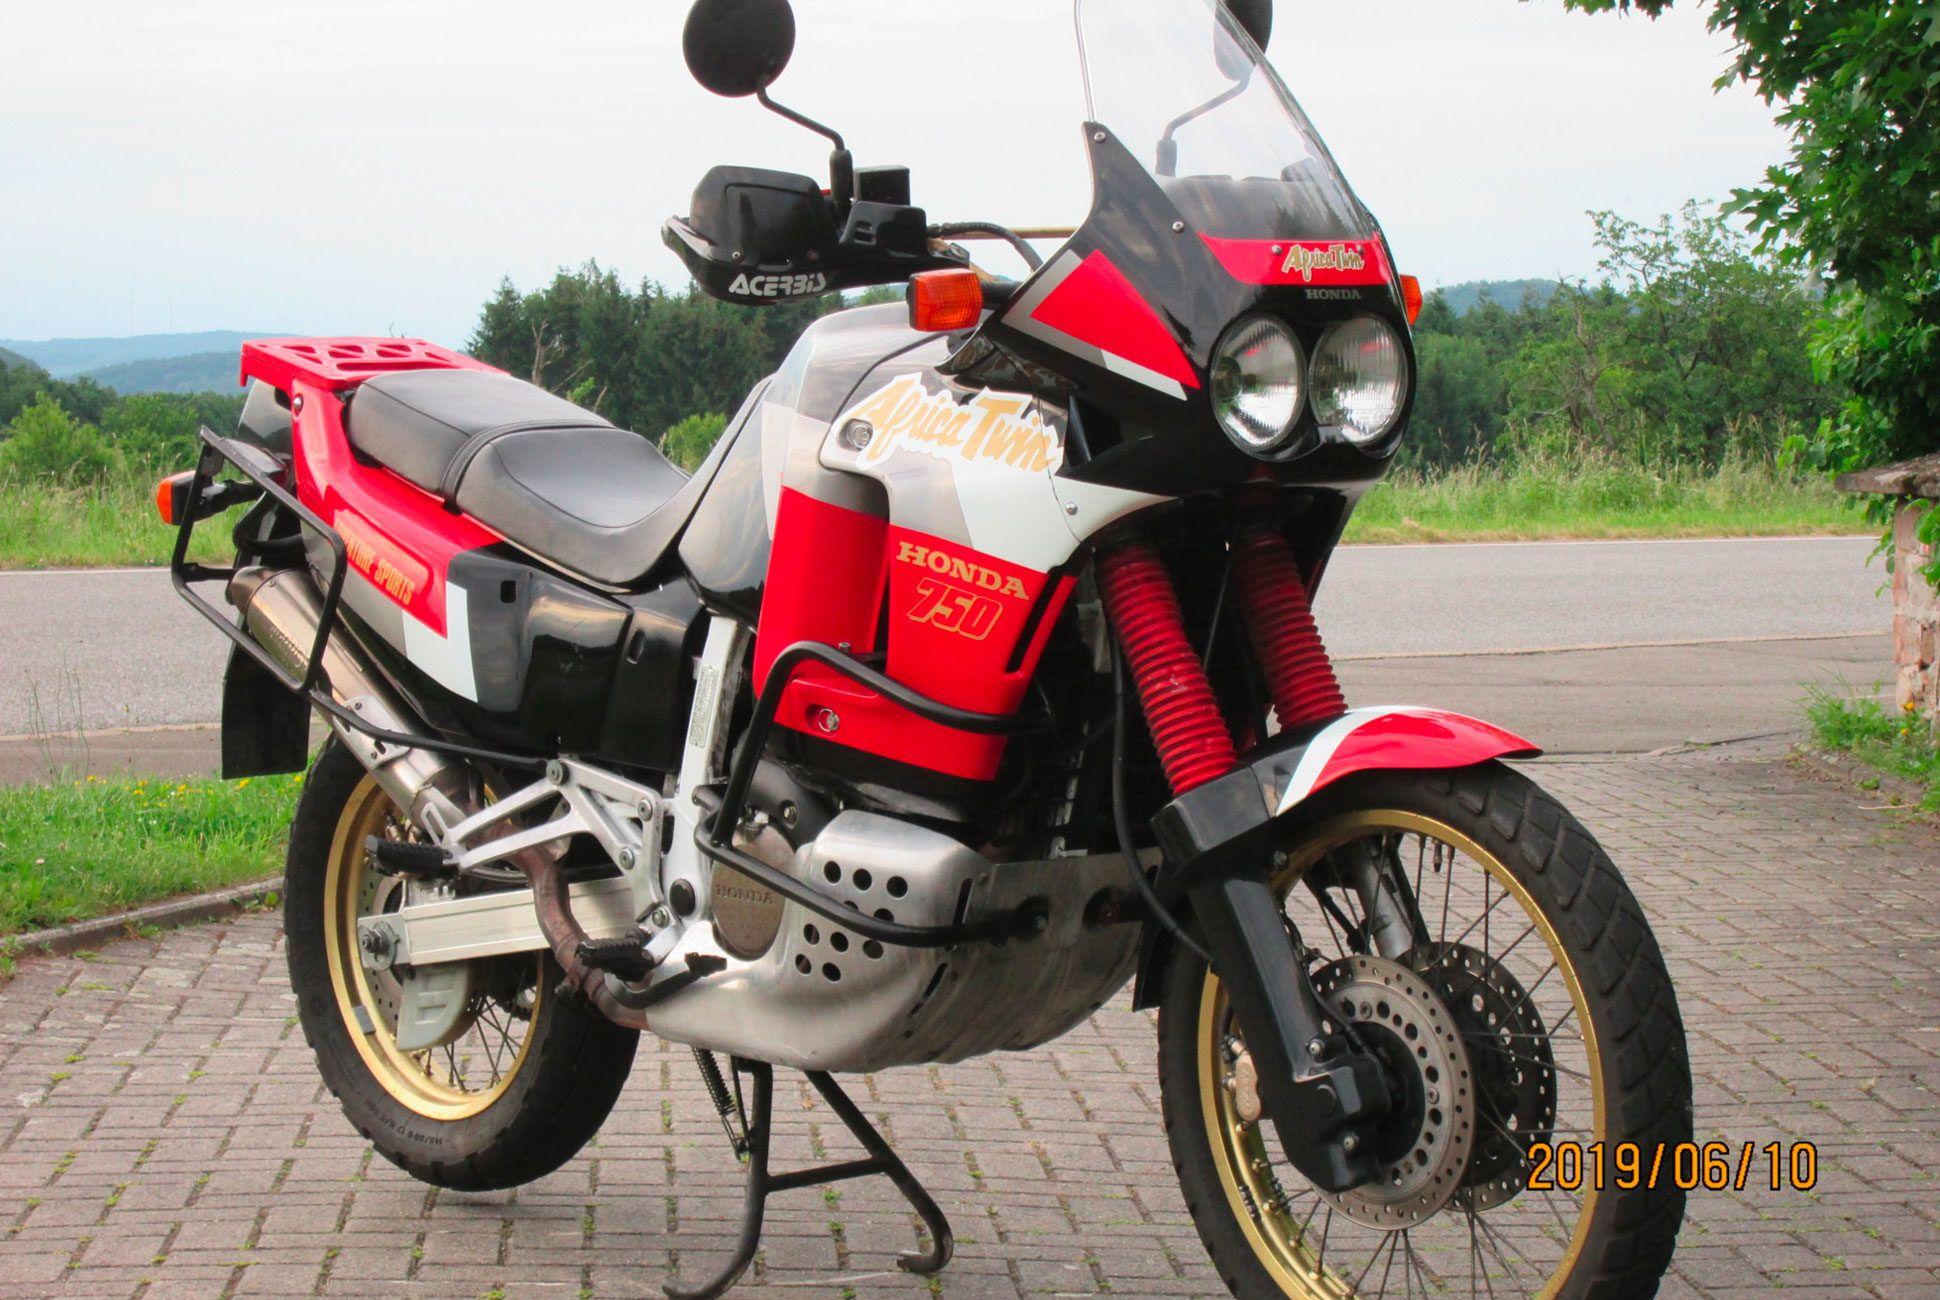 1992-Honda-XRV750-Africa-Twin-RD04-gear-patrol-slide-01